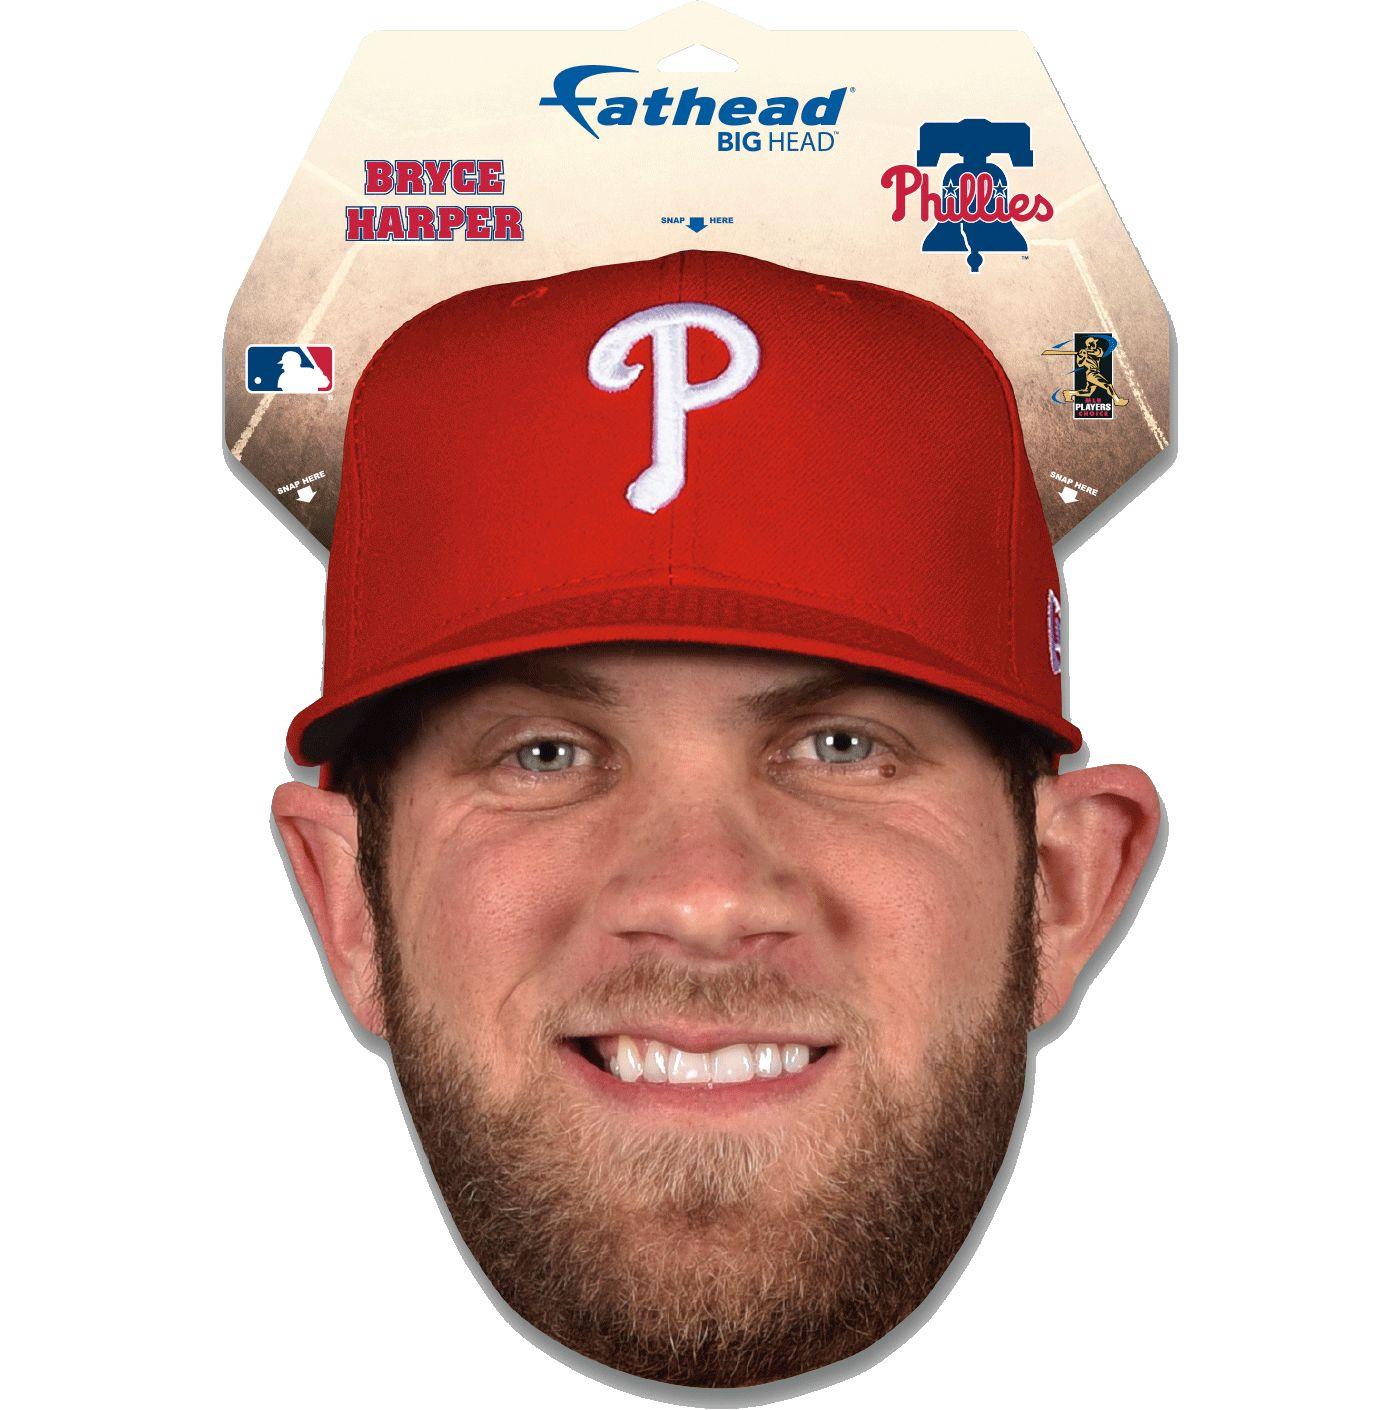 Fathead Philadelphia Phillies Bryce Harper Big Head Decal